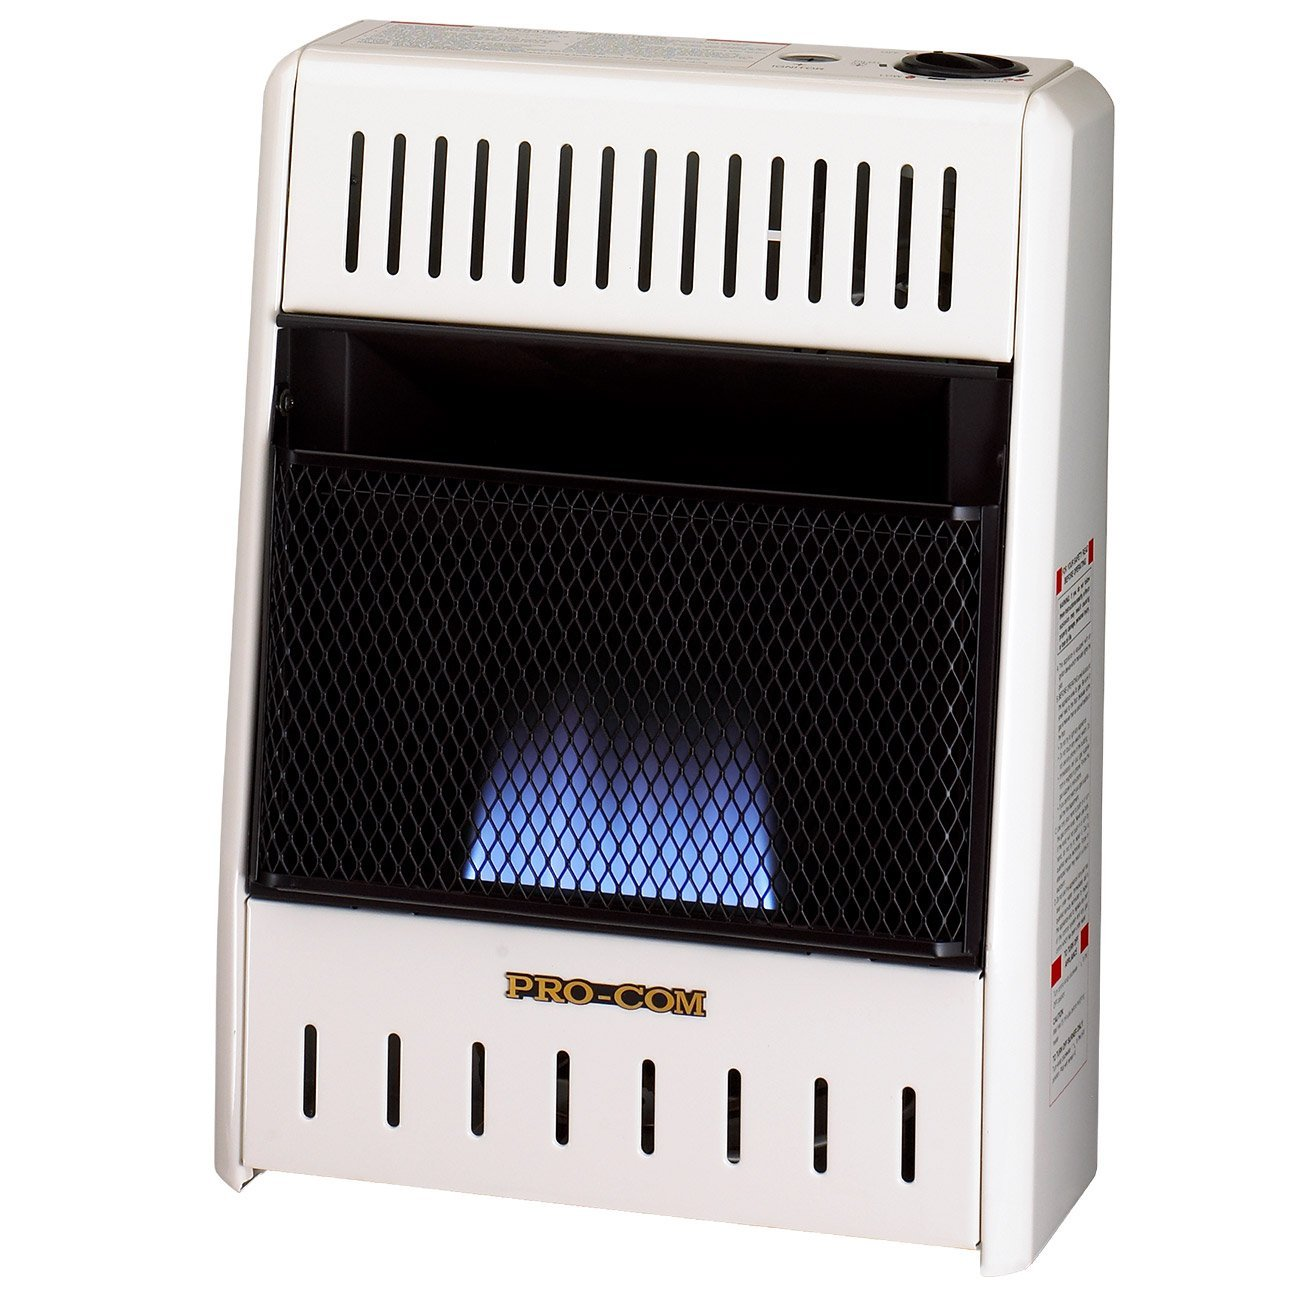 ProCom Liquid Propane Ventless Blue Flame Heater 6,000 BTU, Model# ML060HBA, White by ProCom